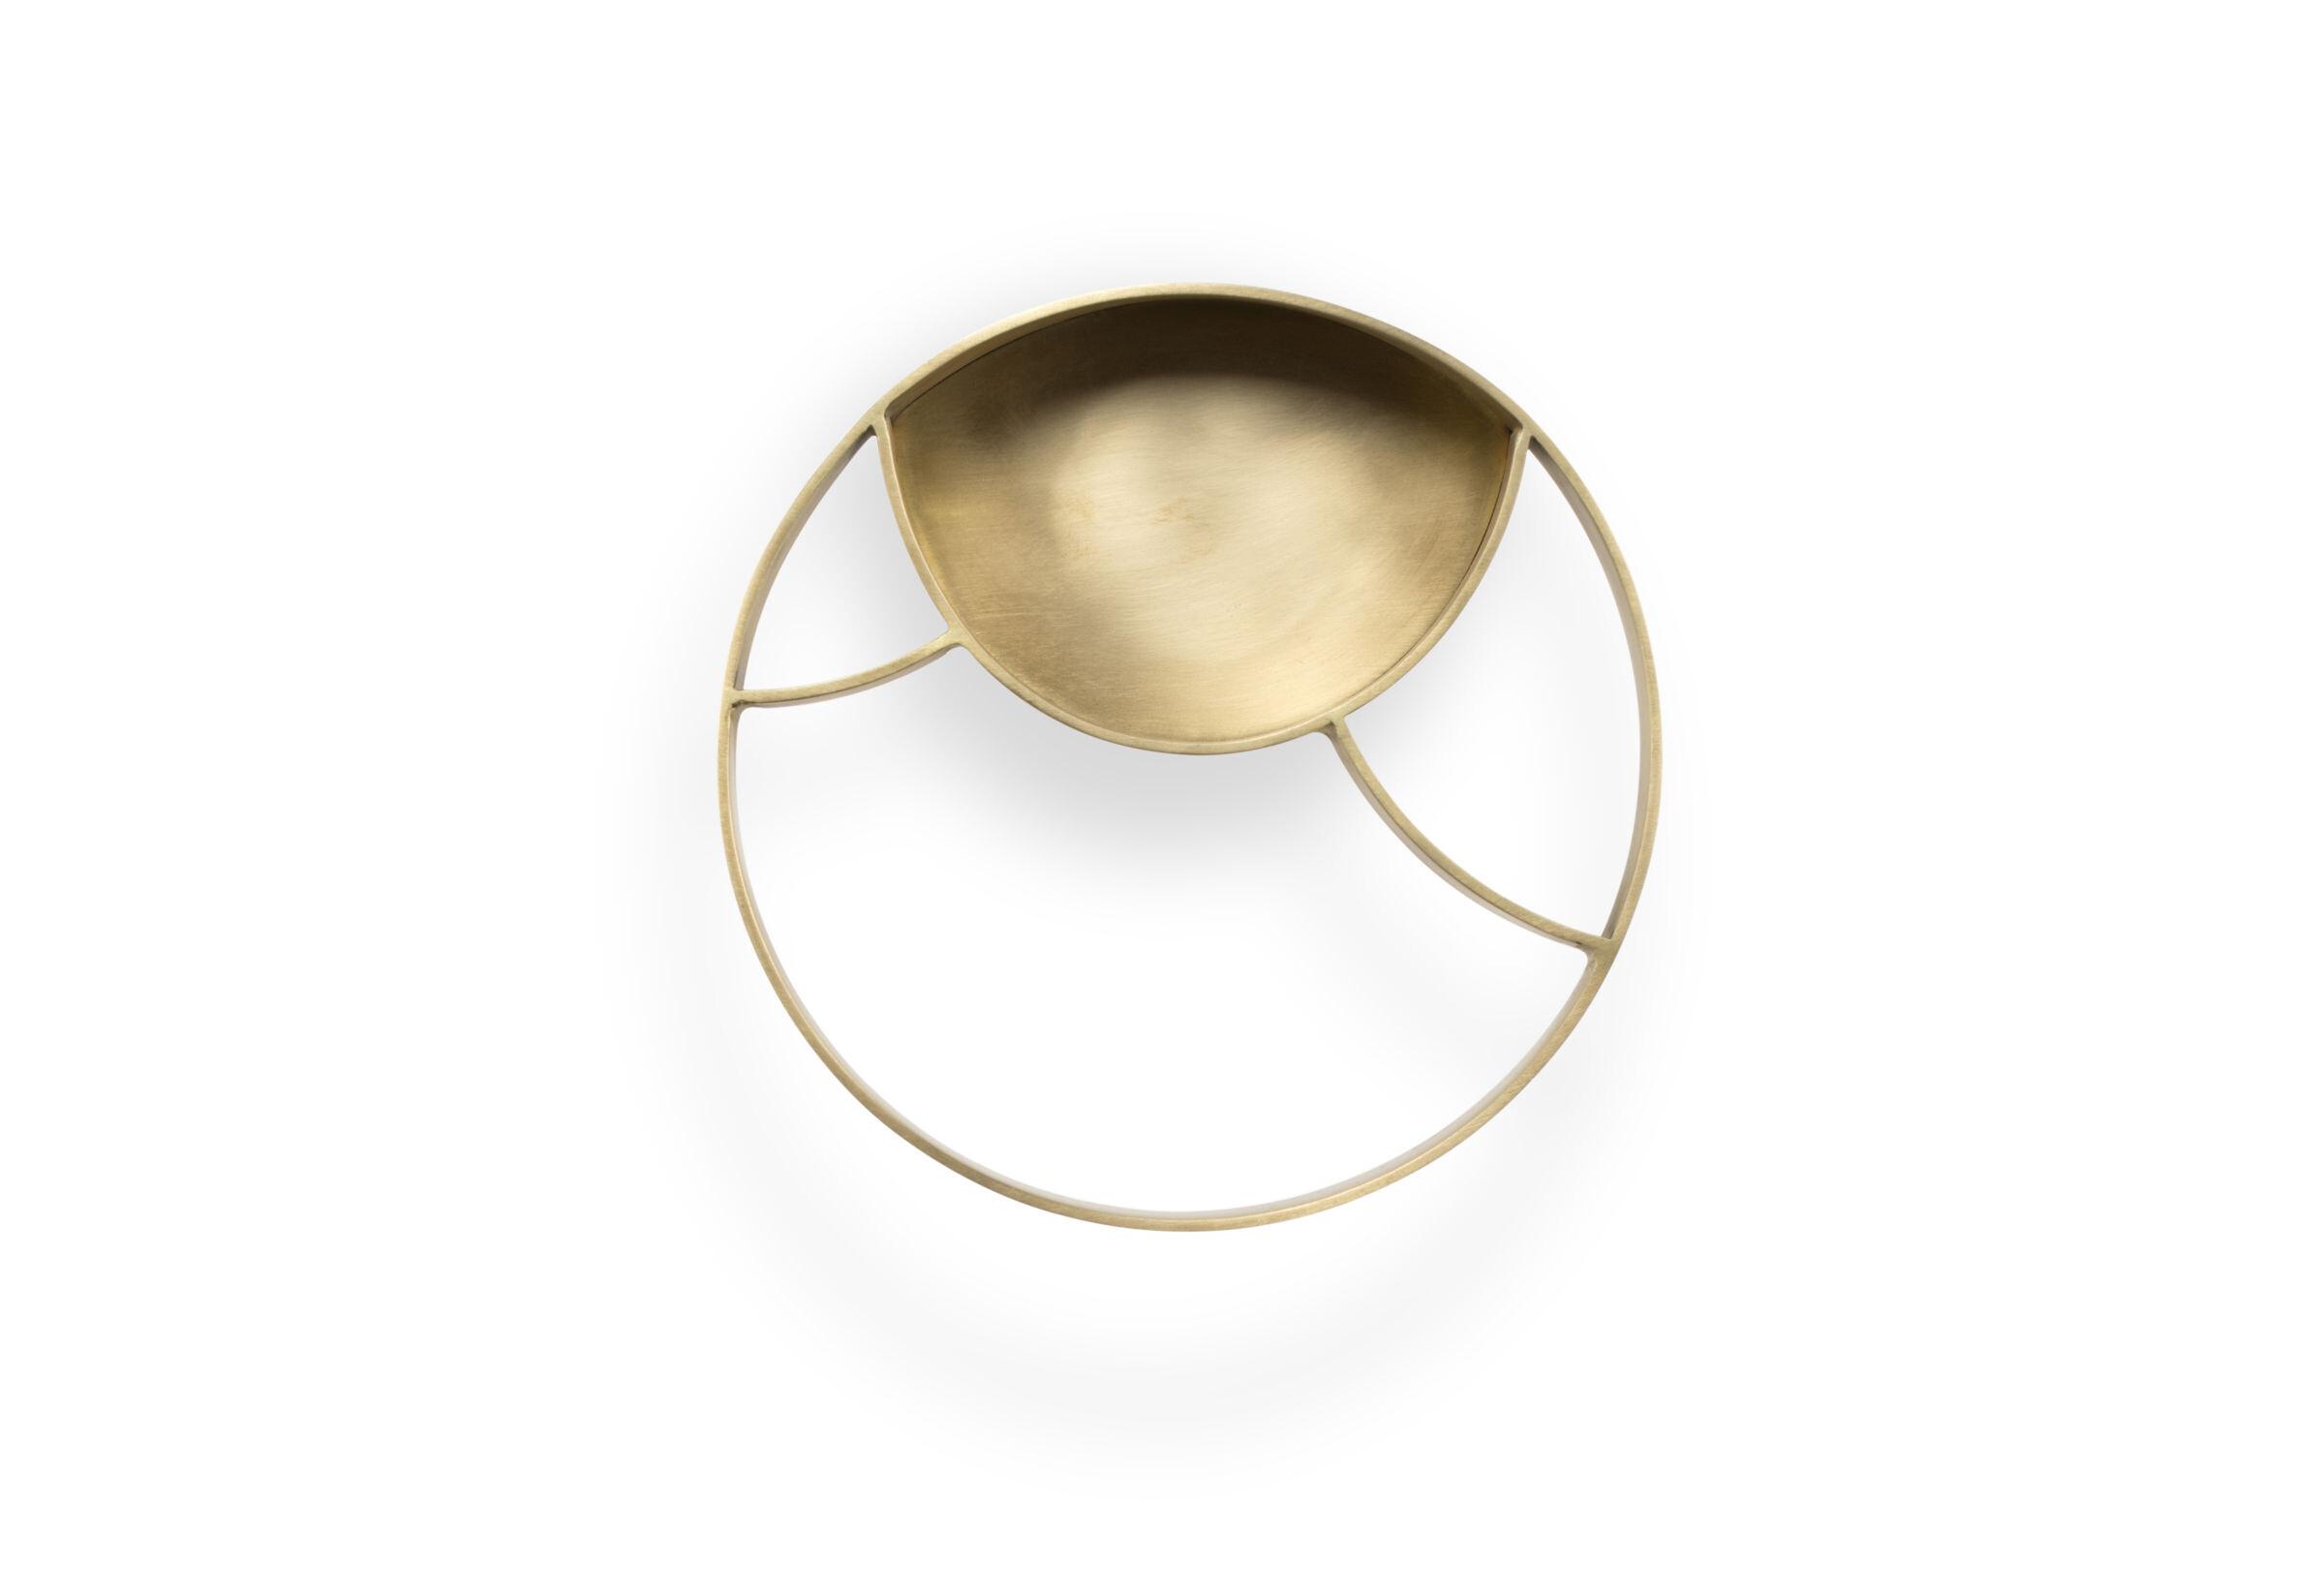 KOI Towel Ring